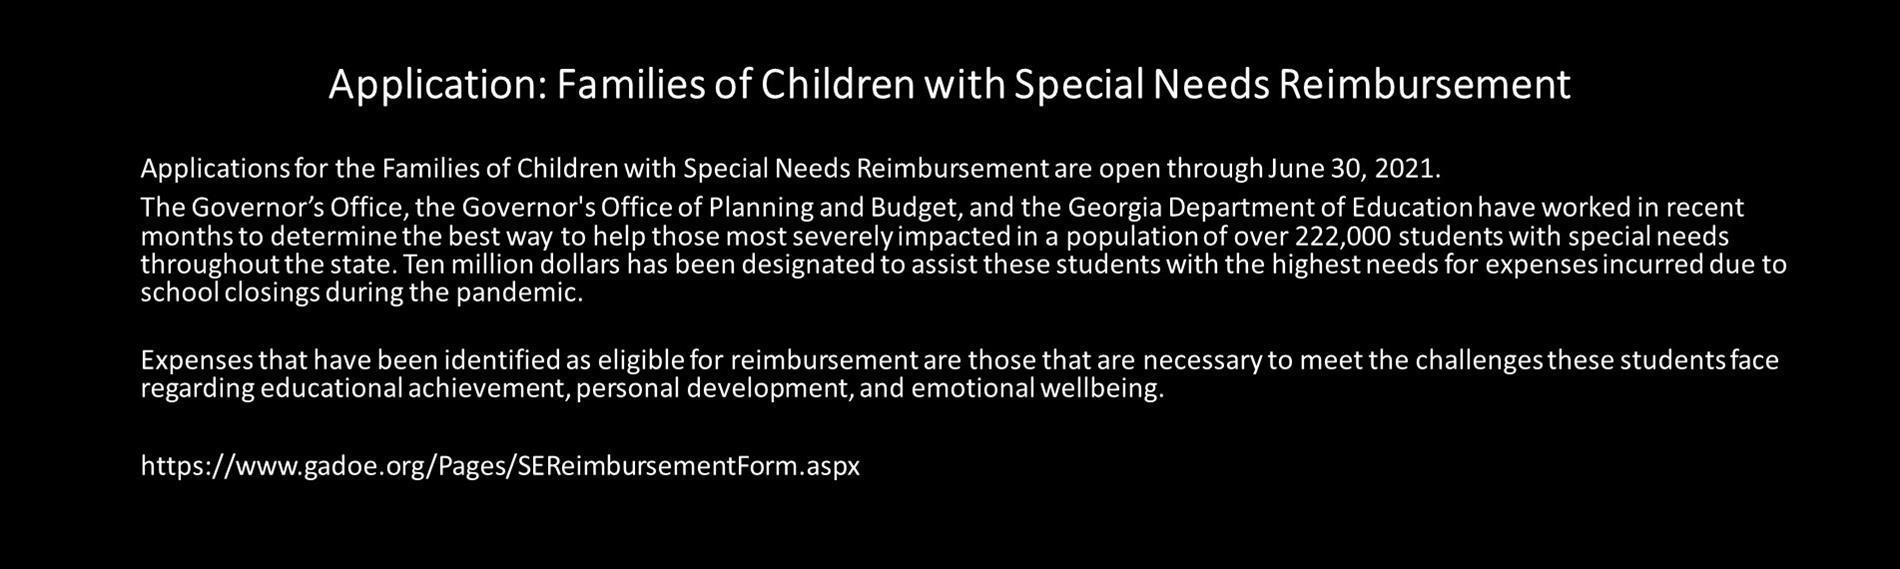 Application: Families of Children with Special Needs Reimbursement